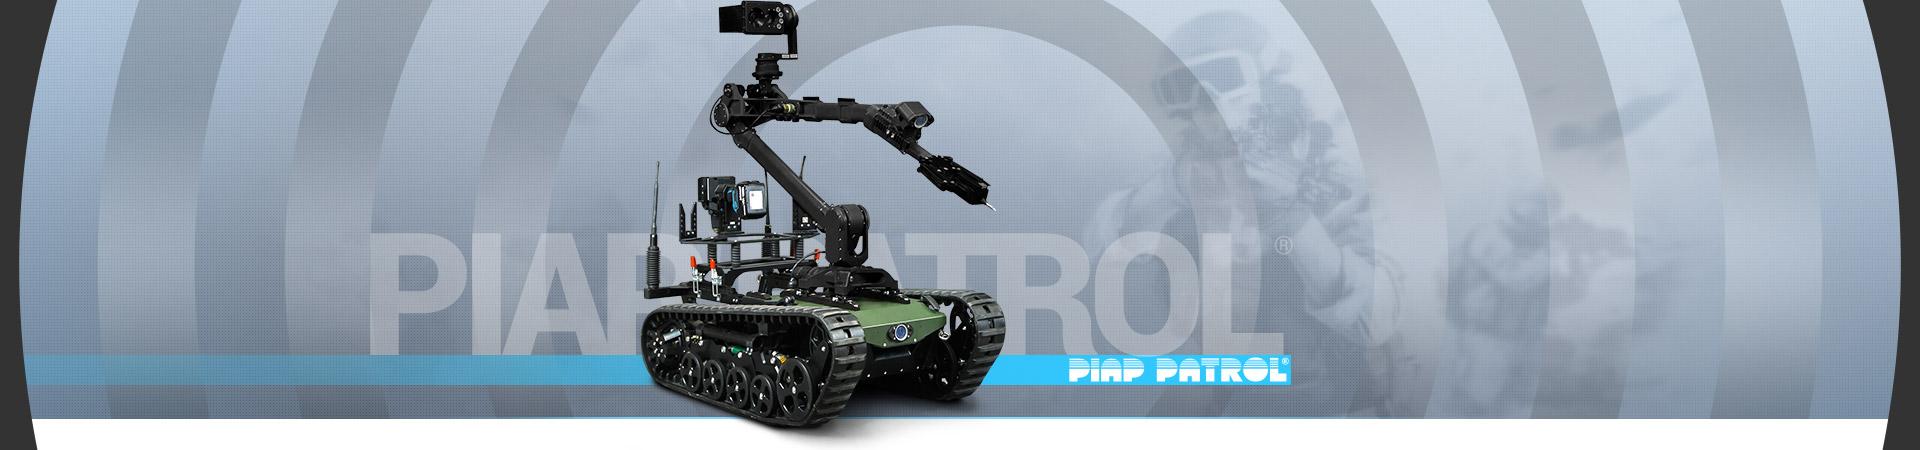 1920x450-patrol-r